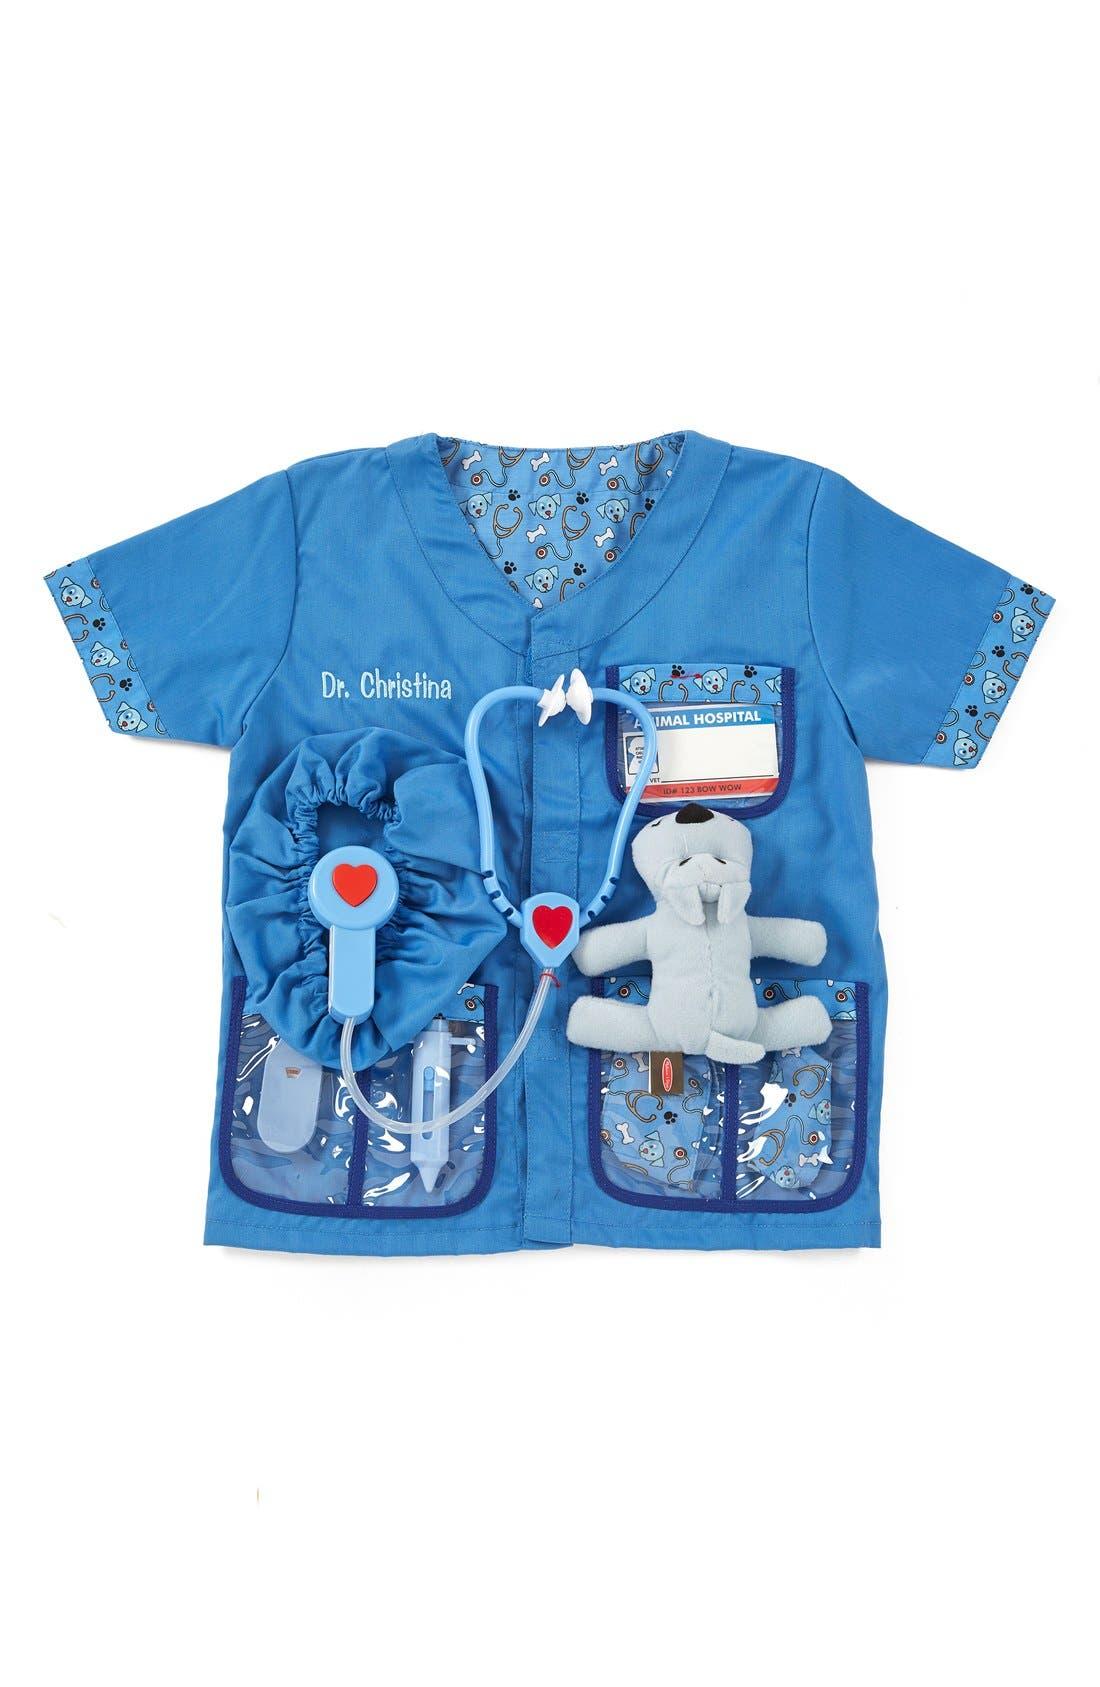 Melissa & Doug 'Veterinarian' Personalized Costume Set (Toddler)